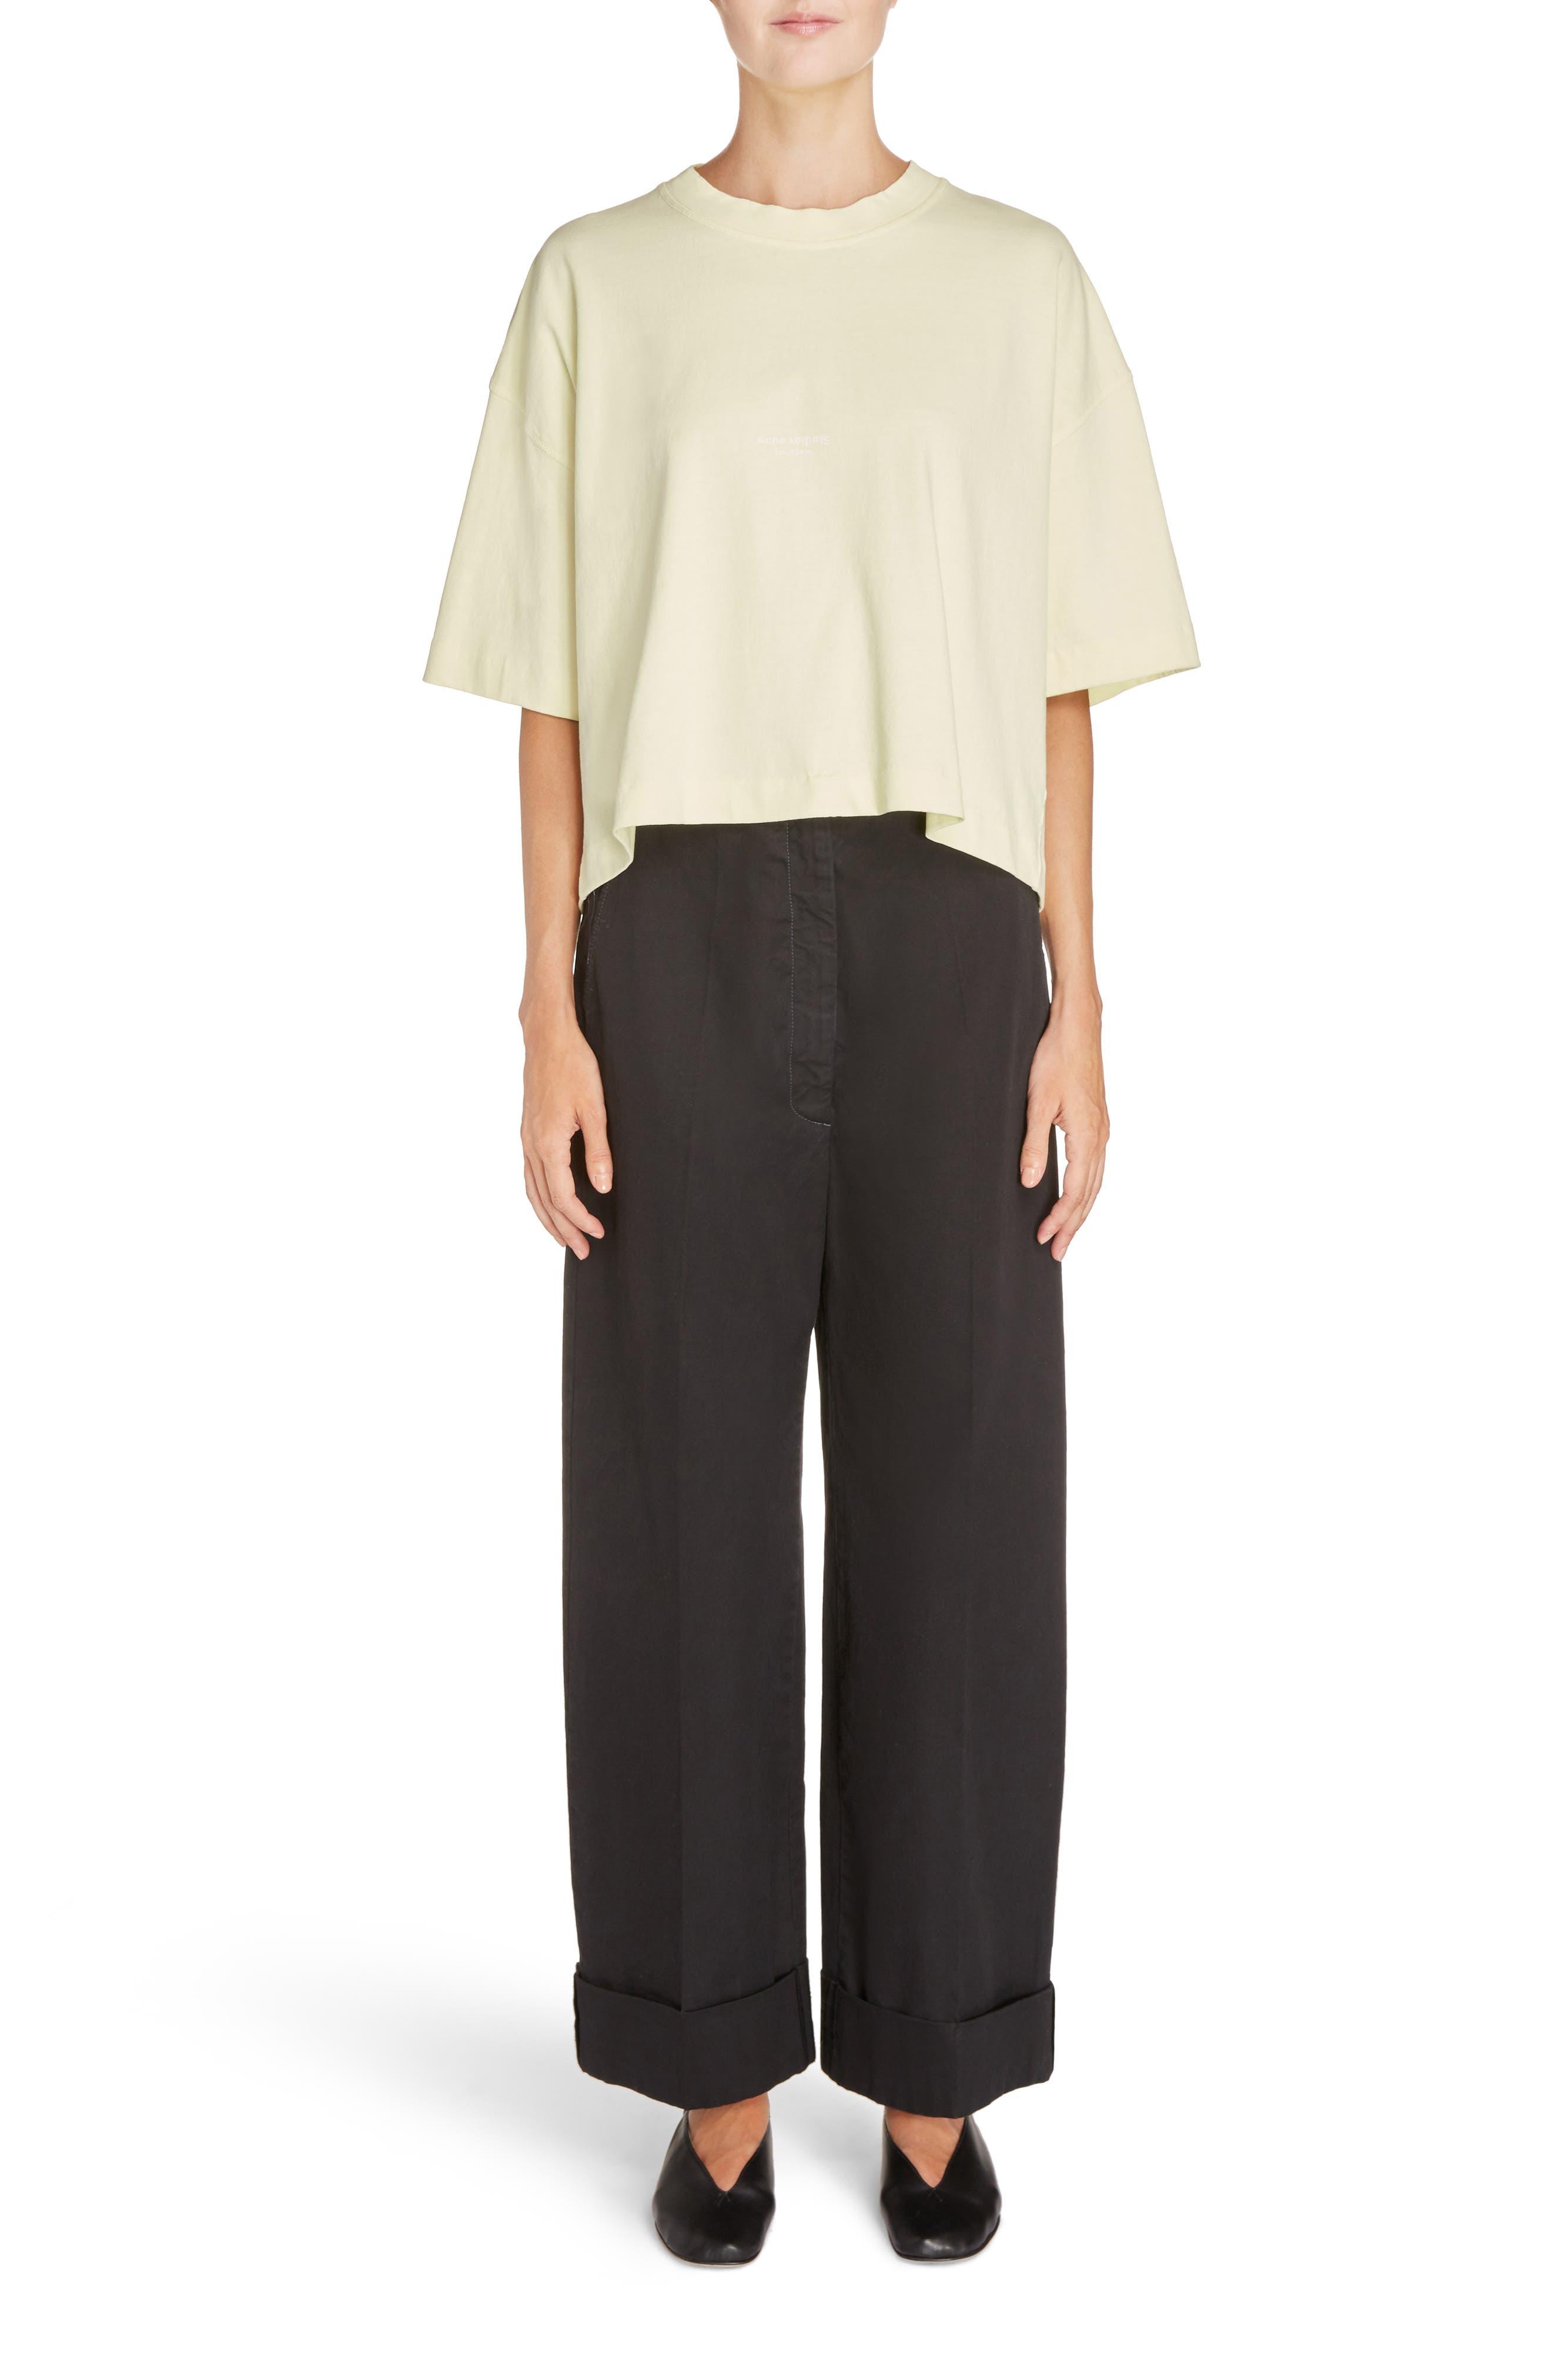 Madya Cuffed Cotton Pants,                             Alternate thumbnail 4, color,                             Black